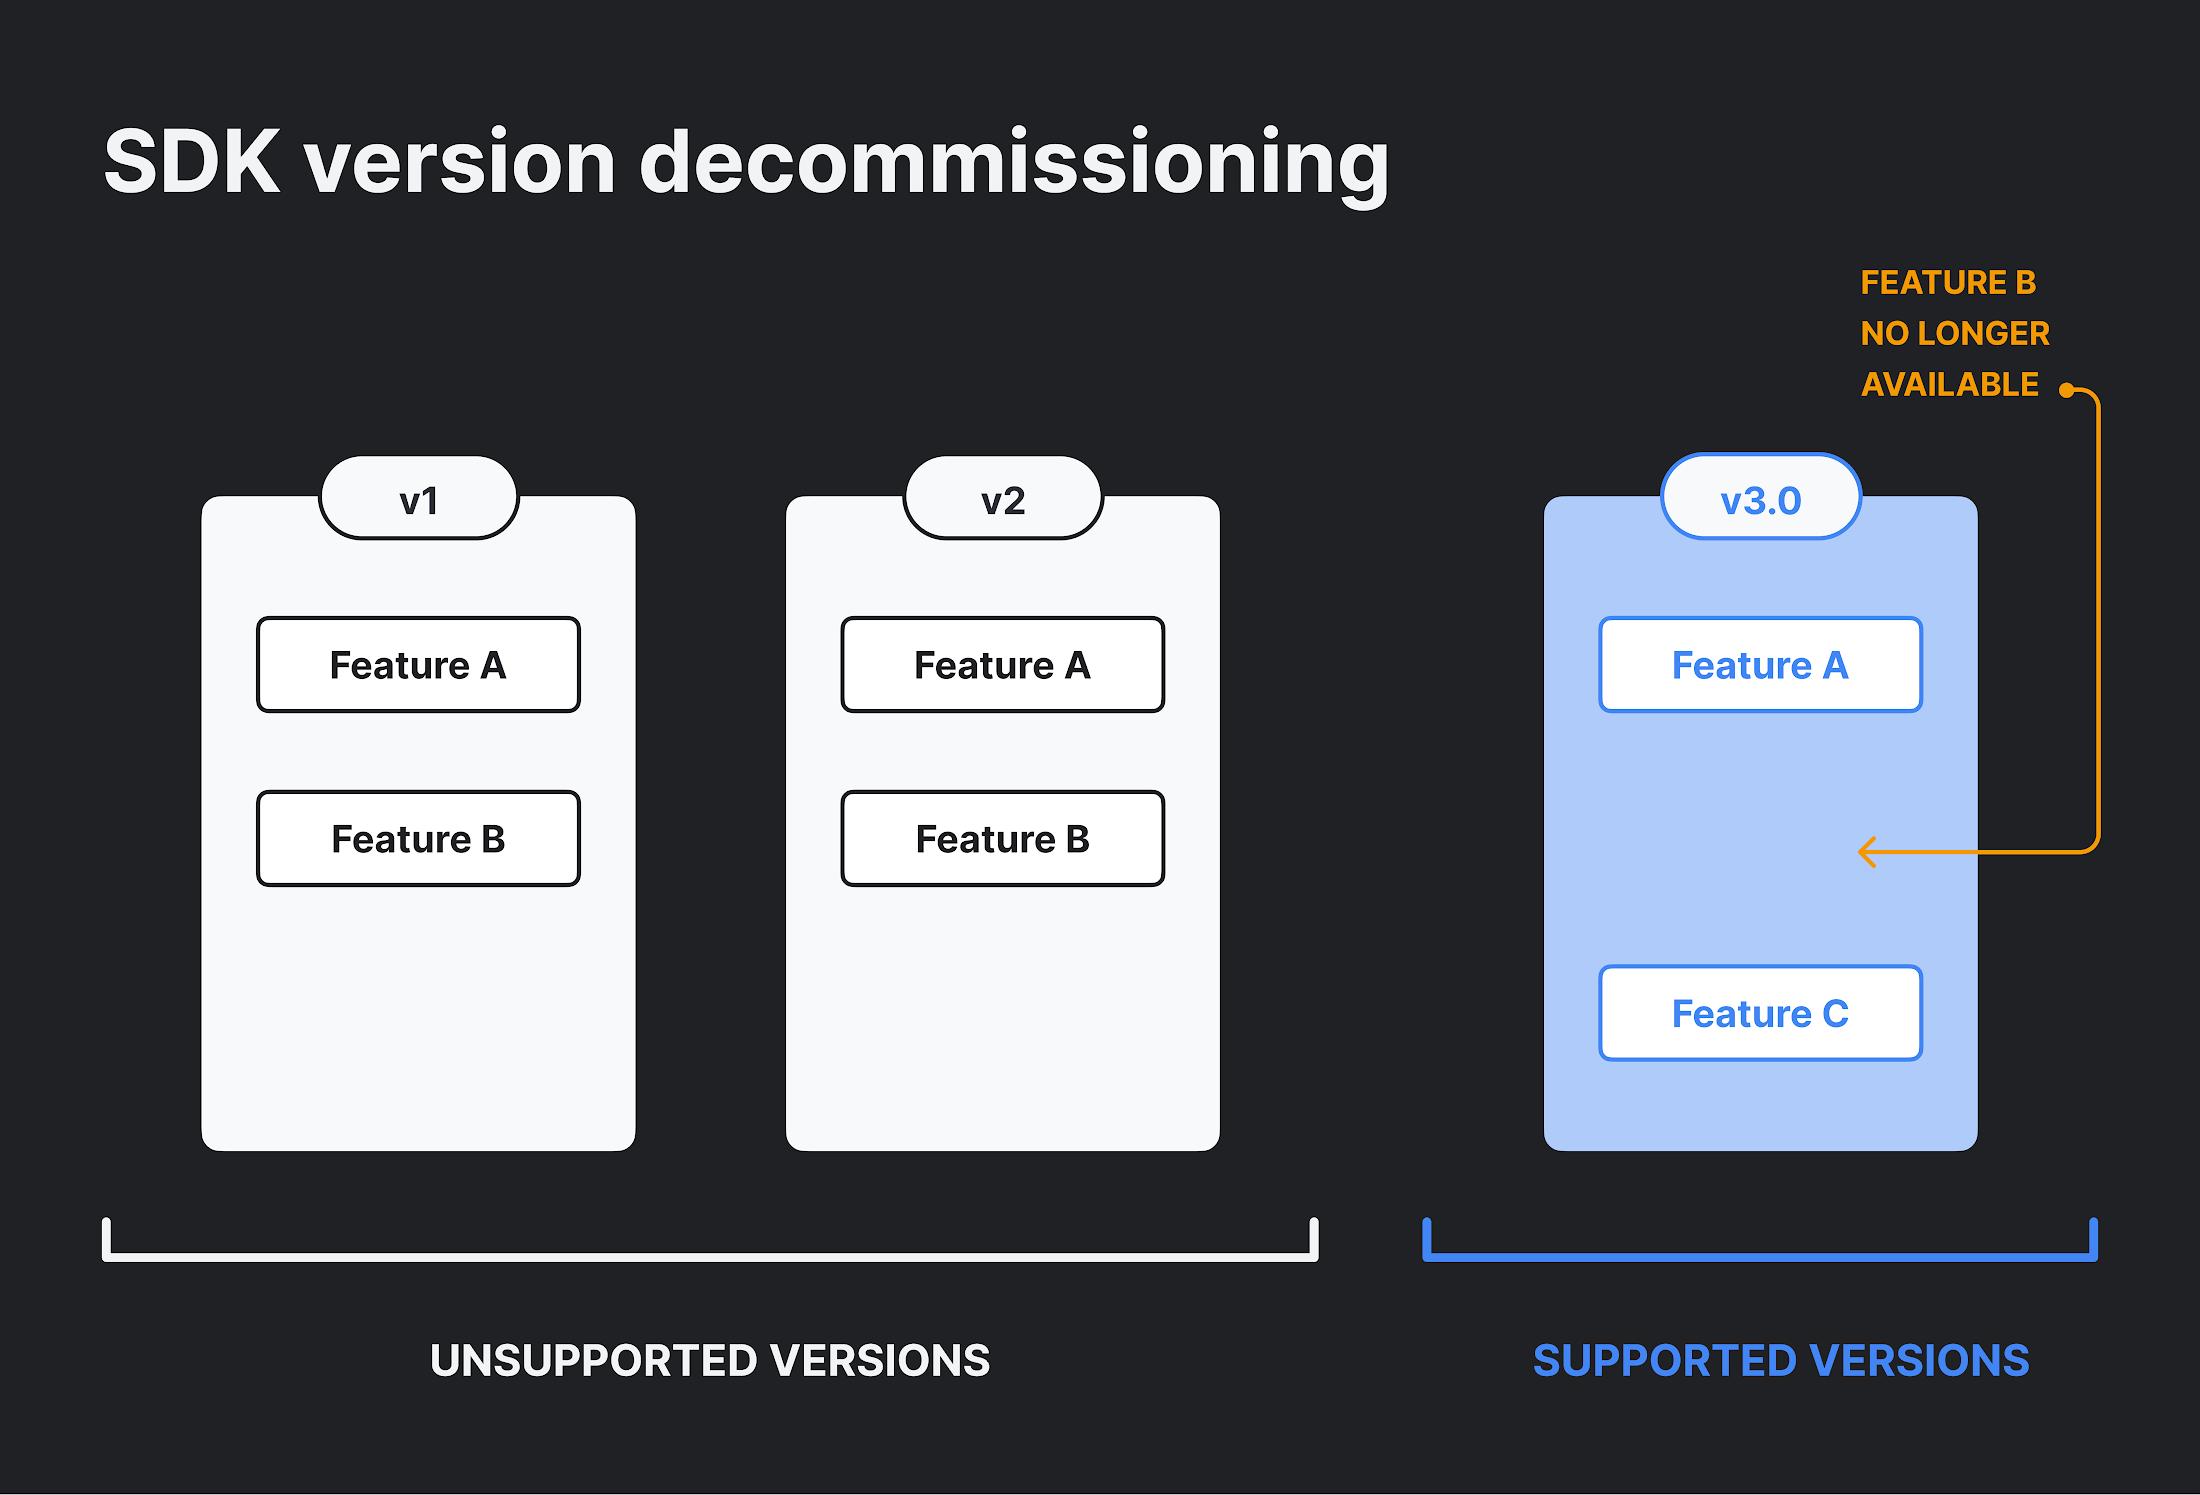 SDK Version Decommissioning